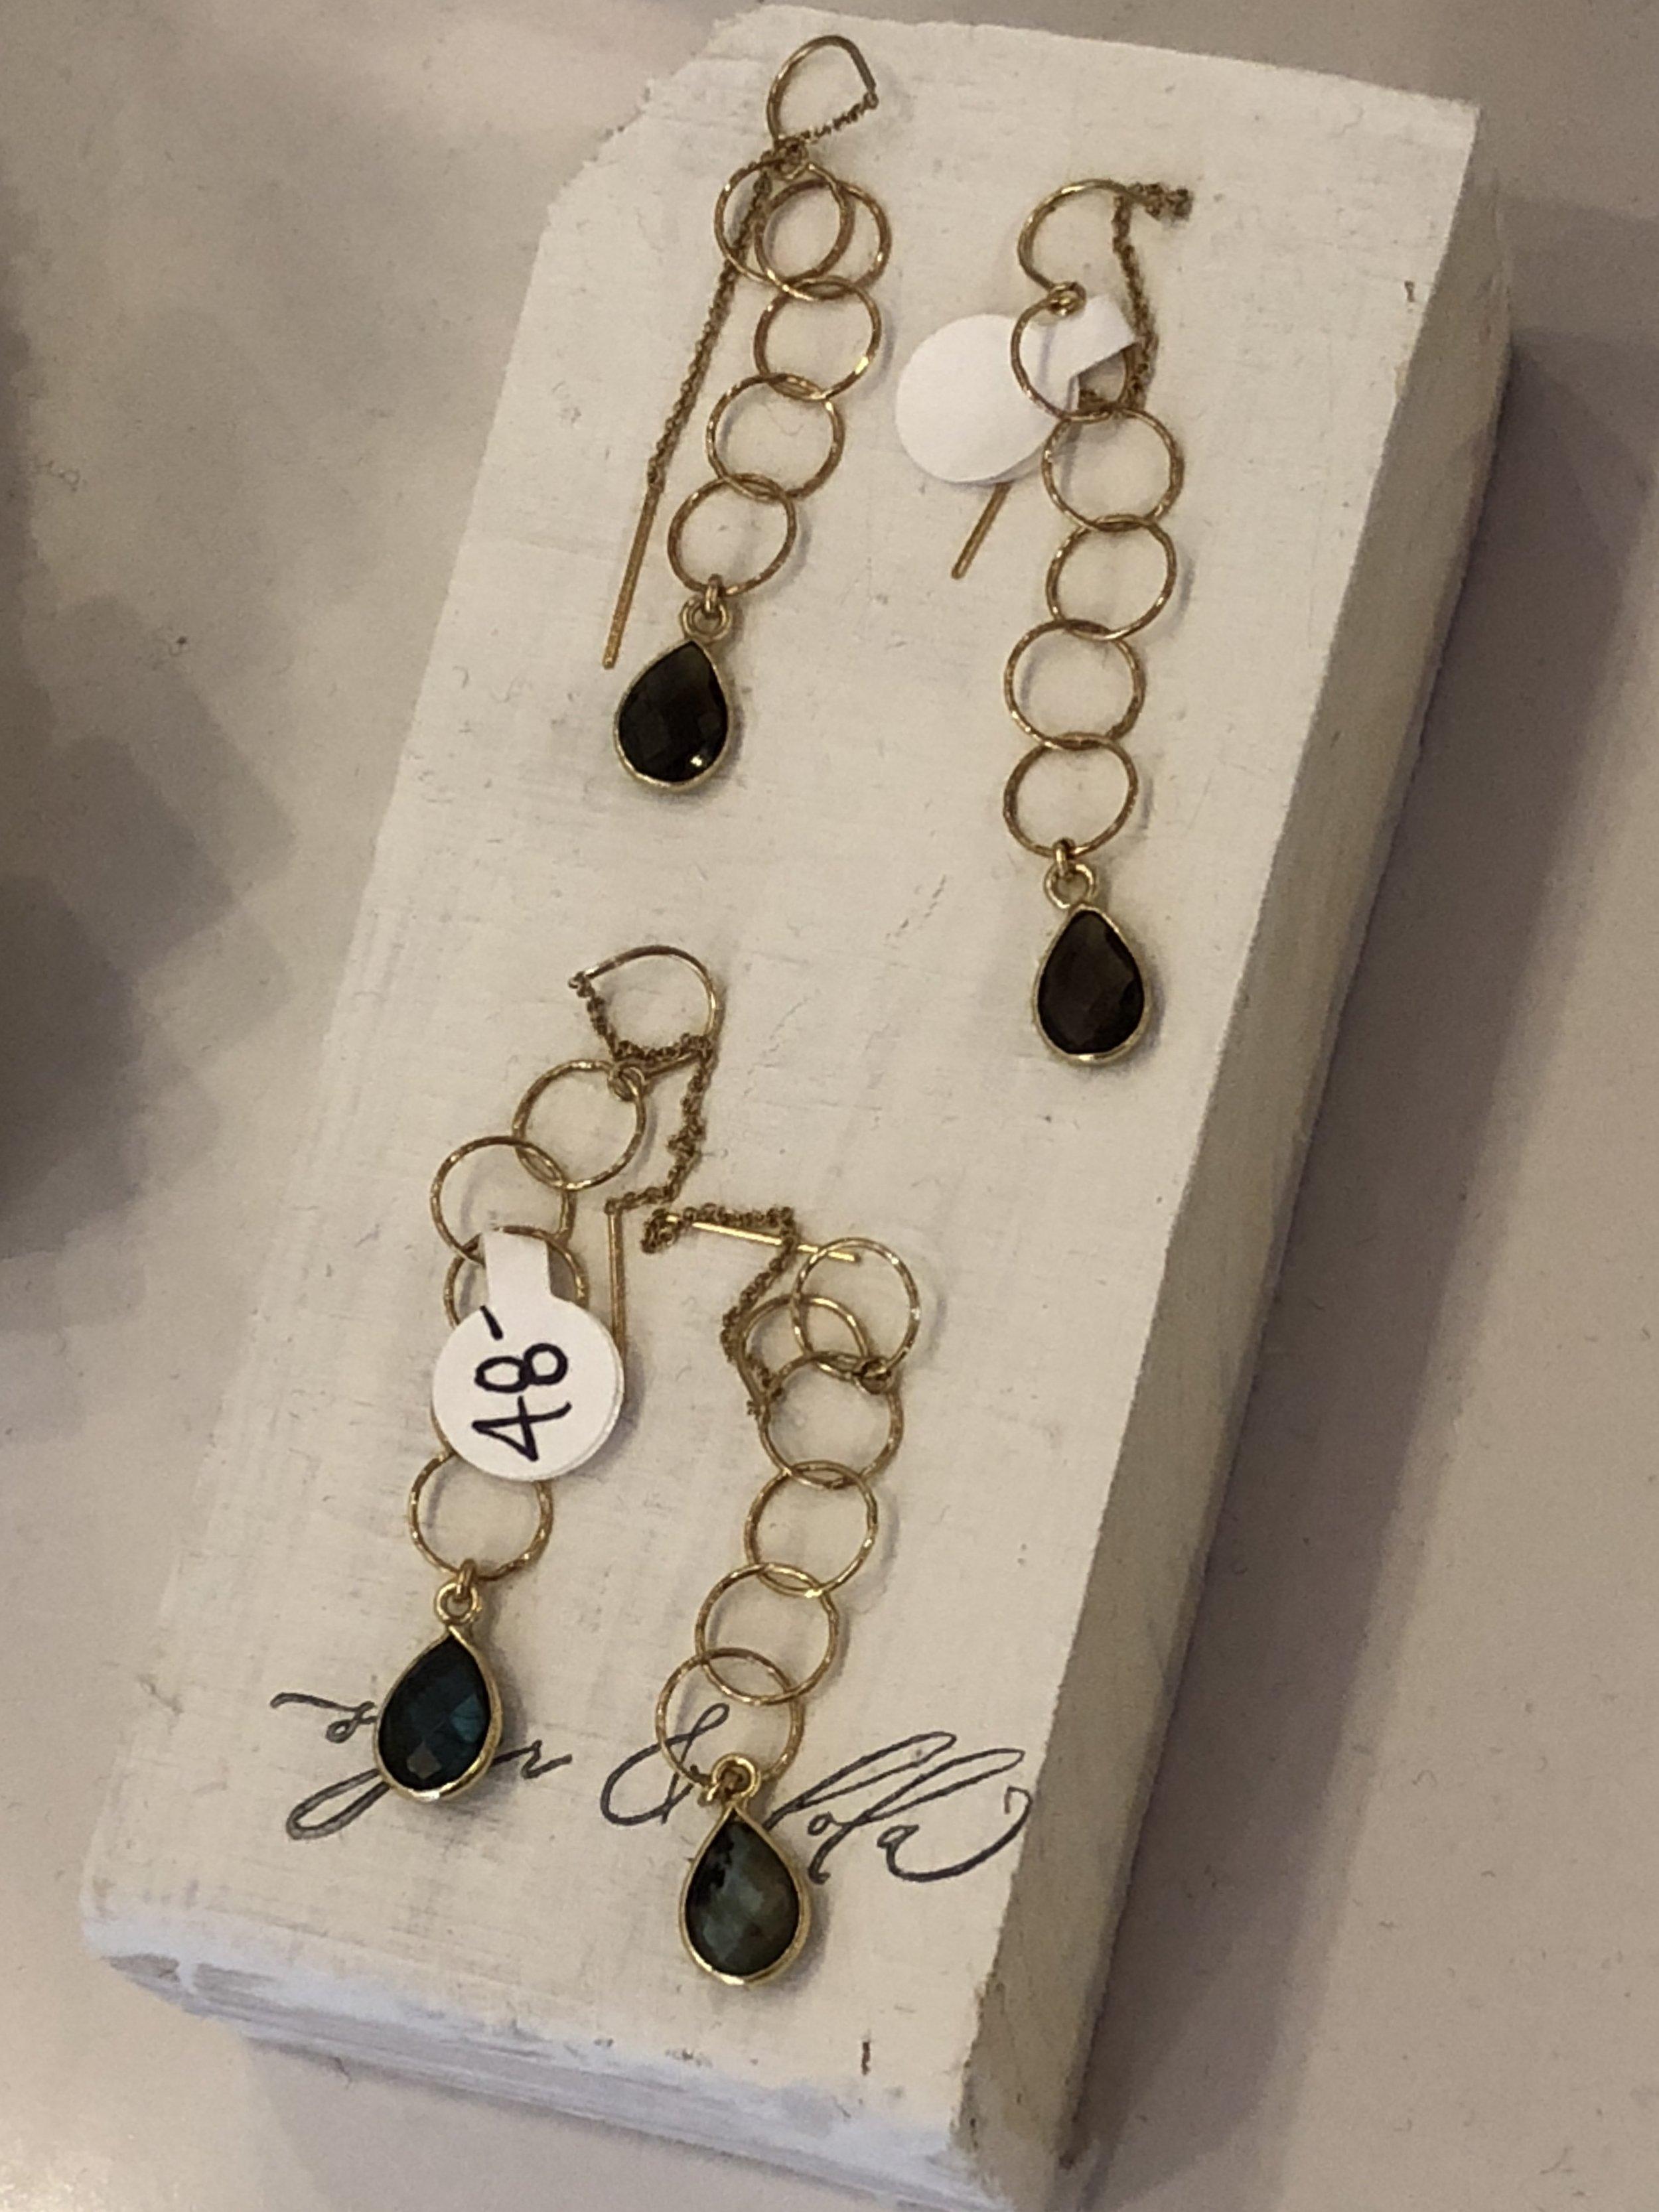 Earrings by Sugar & Lola